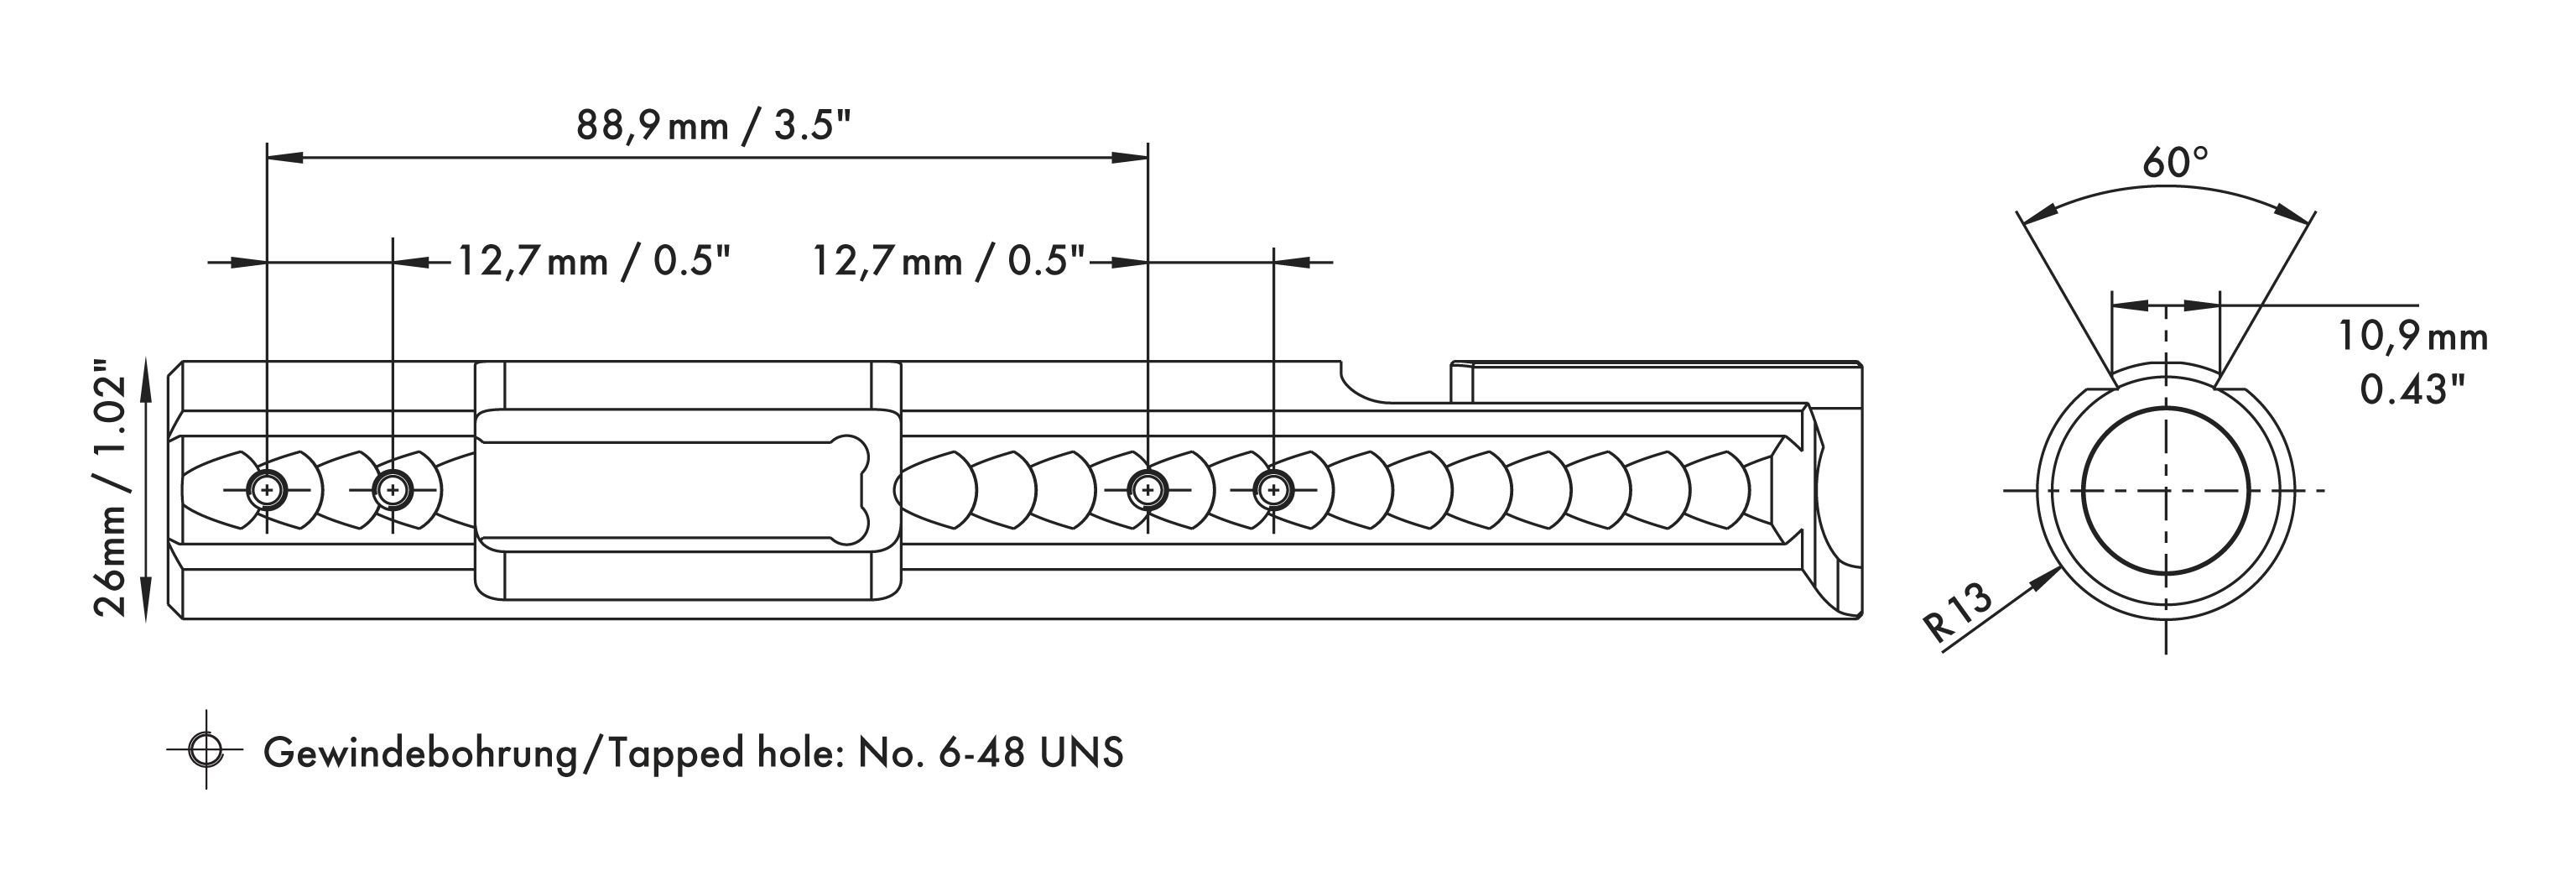 Anschutz 1417 receiver